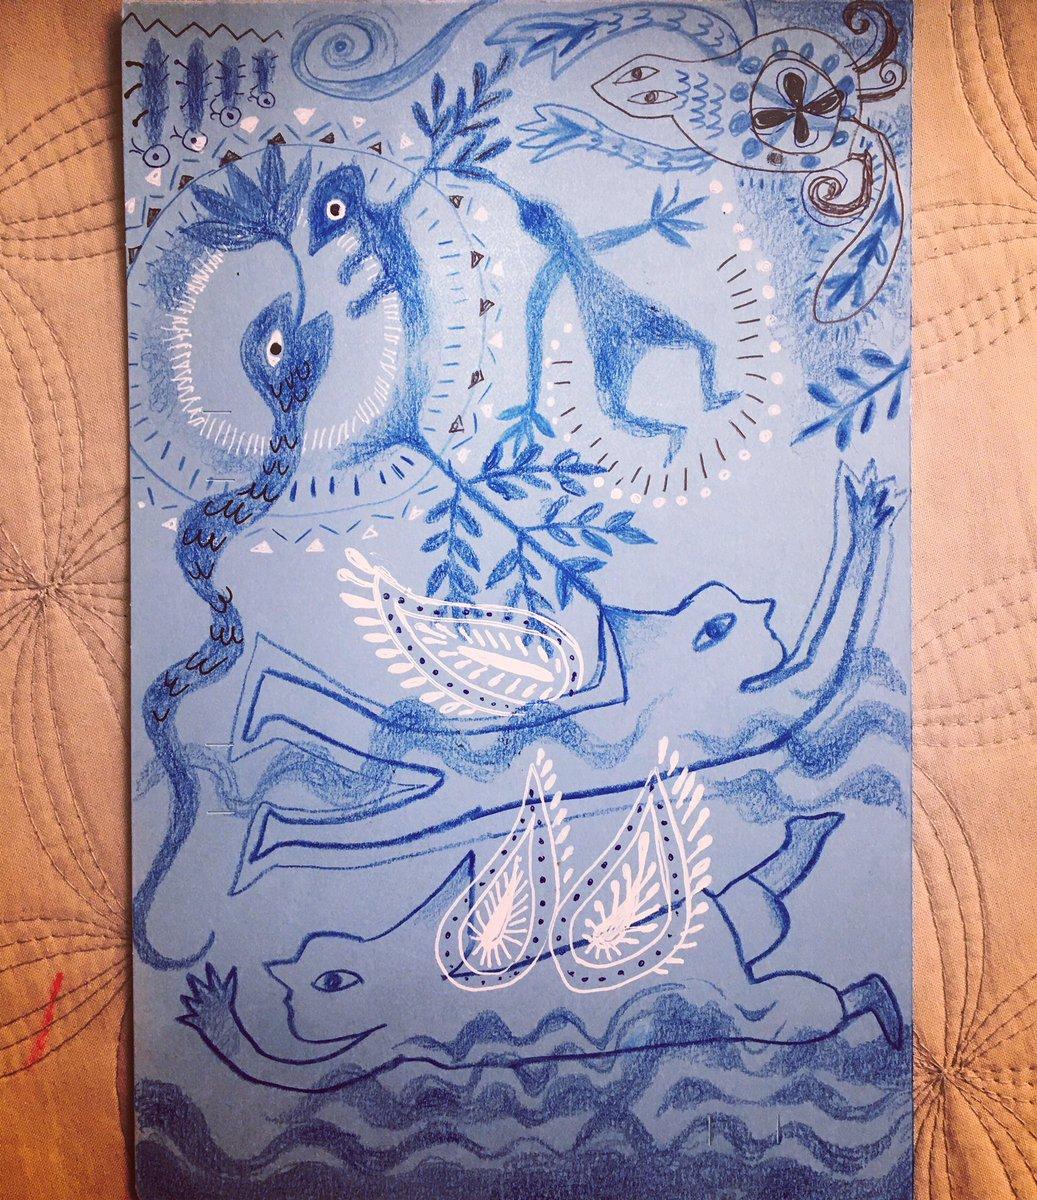 Awkward, but fly together ぎこちなく、でも一緒に飛ぶ #art #artgallery  #taracyanel #mindsketch https://t.co/Lz4ZPtTguZ